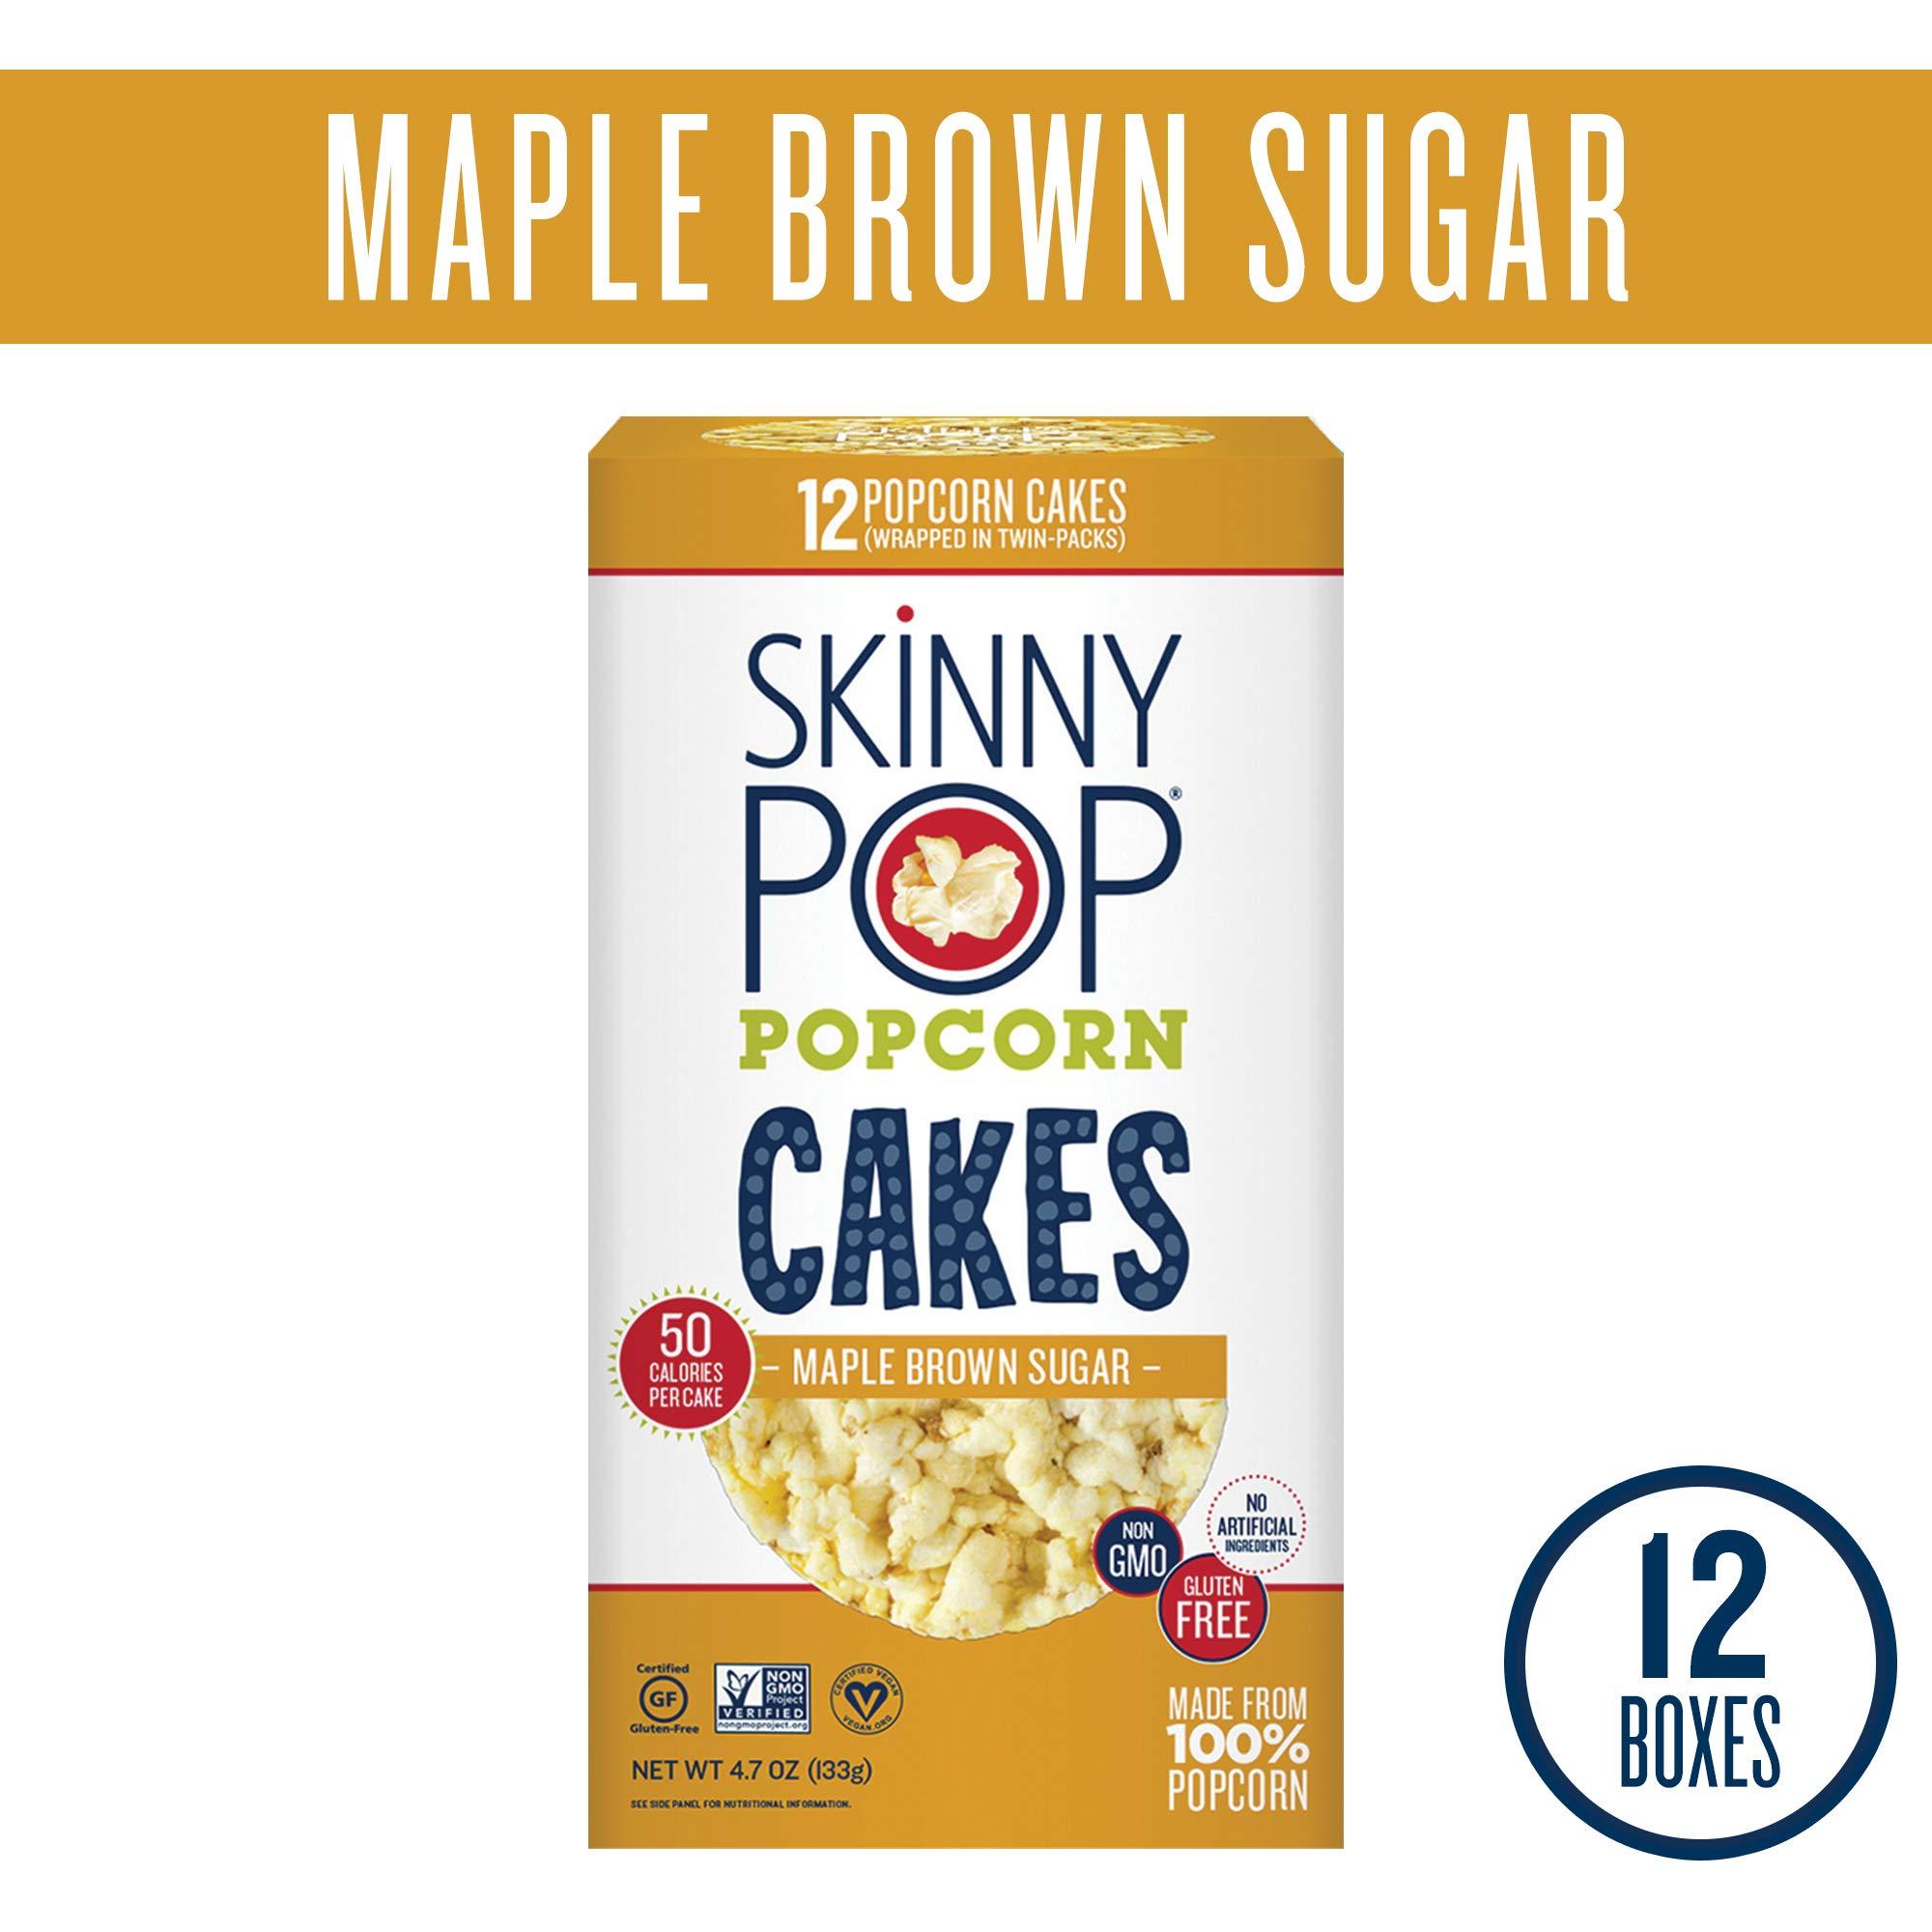 SkinnyPop Popcorn Cakes, Maple Brown Sugar Popcorn Cakes, 4.7 Ounce (Pack of 12) by SkinnyPop (Image #1)